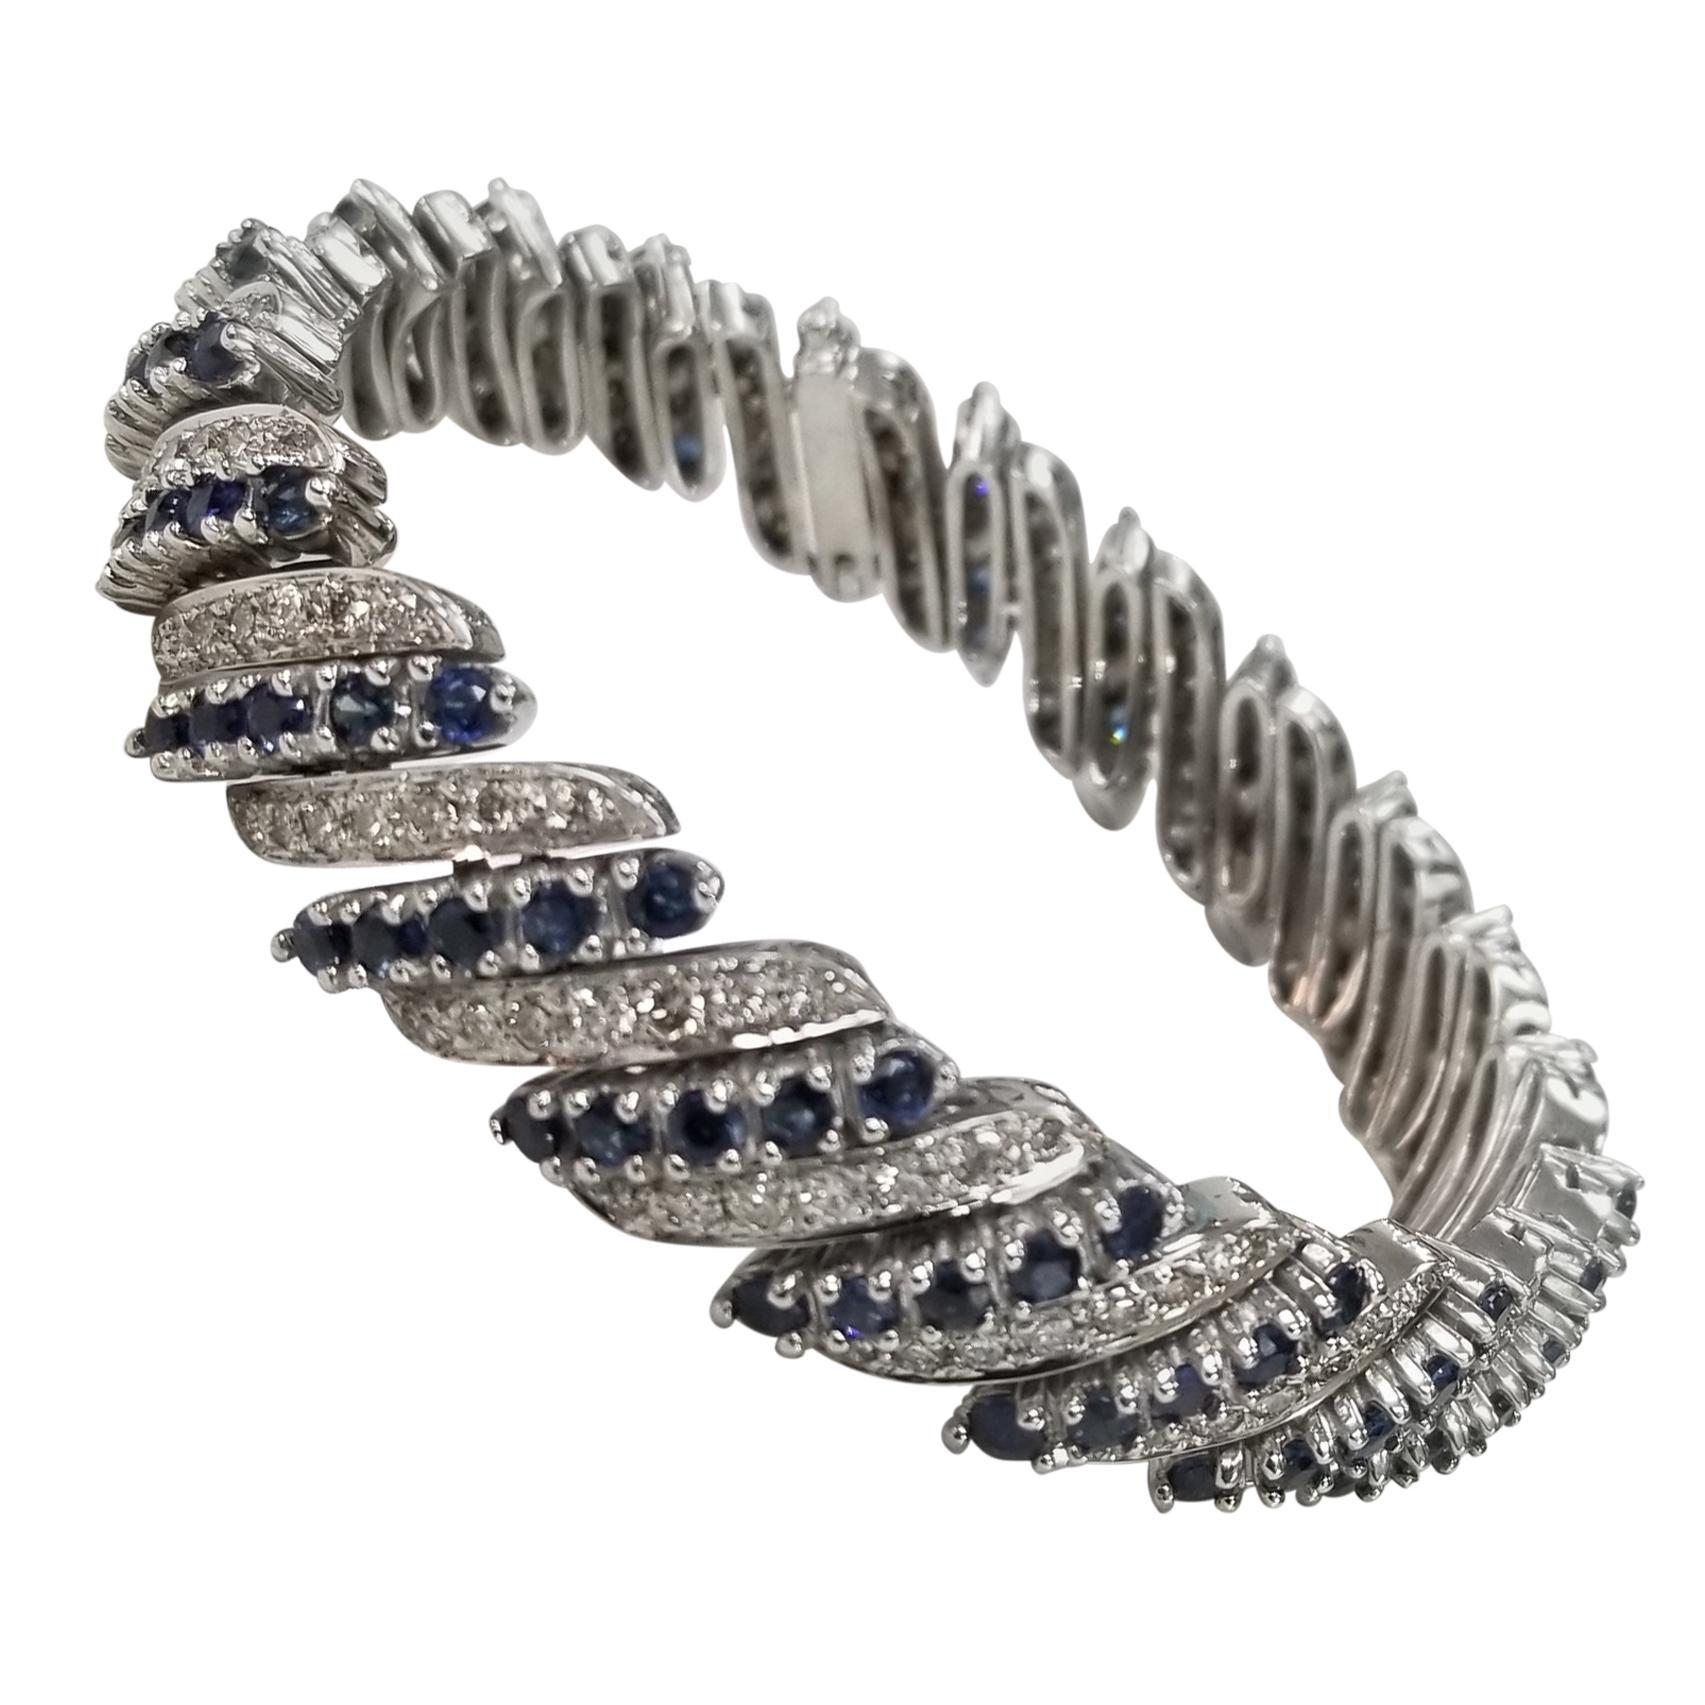 14 Karat White Gold Diamond and Sapphire Flexible Bracelet